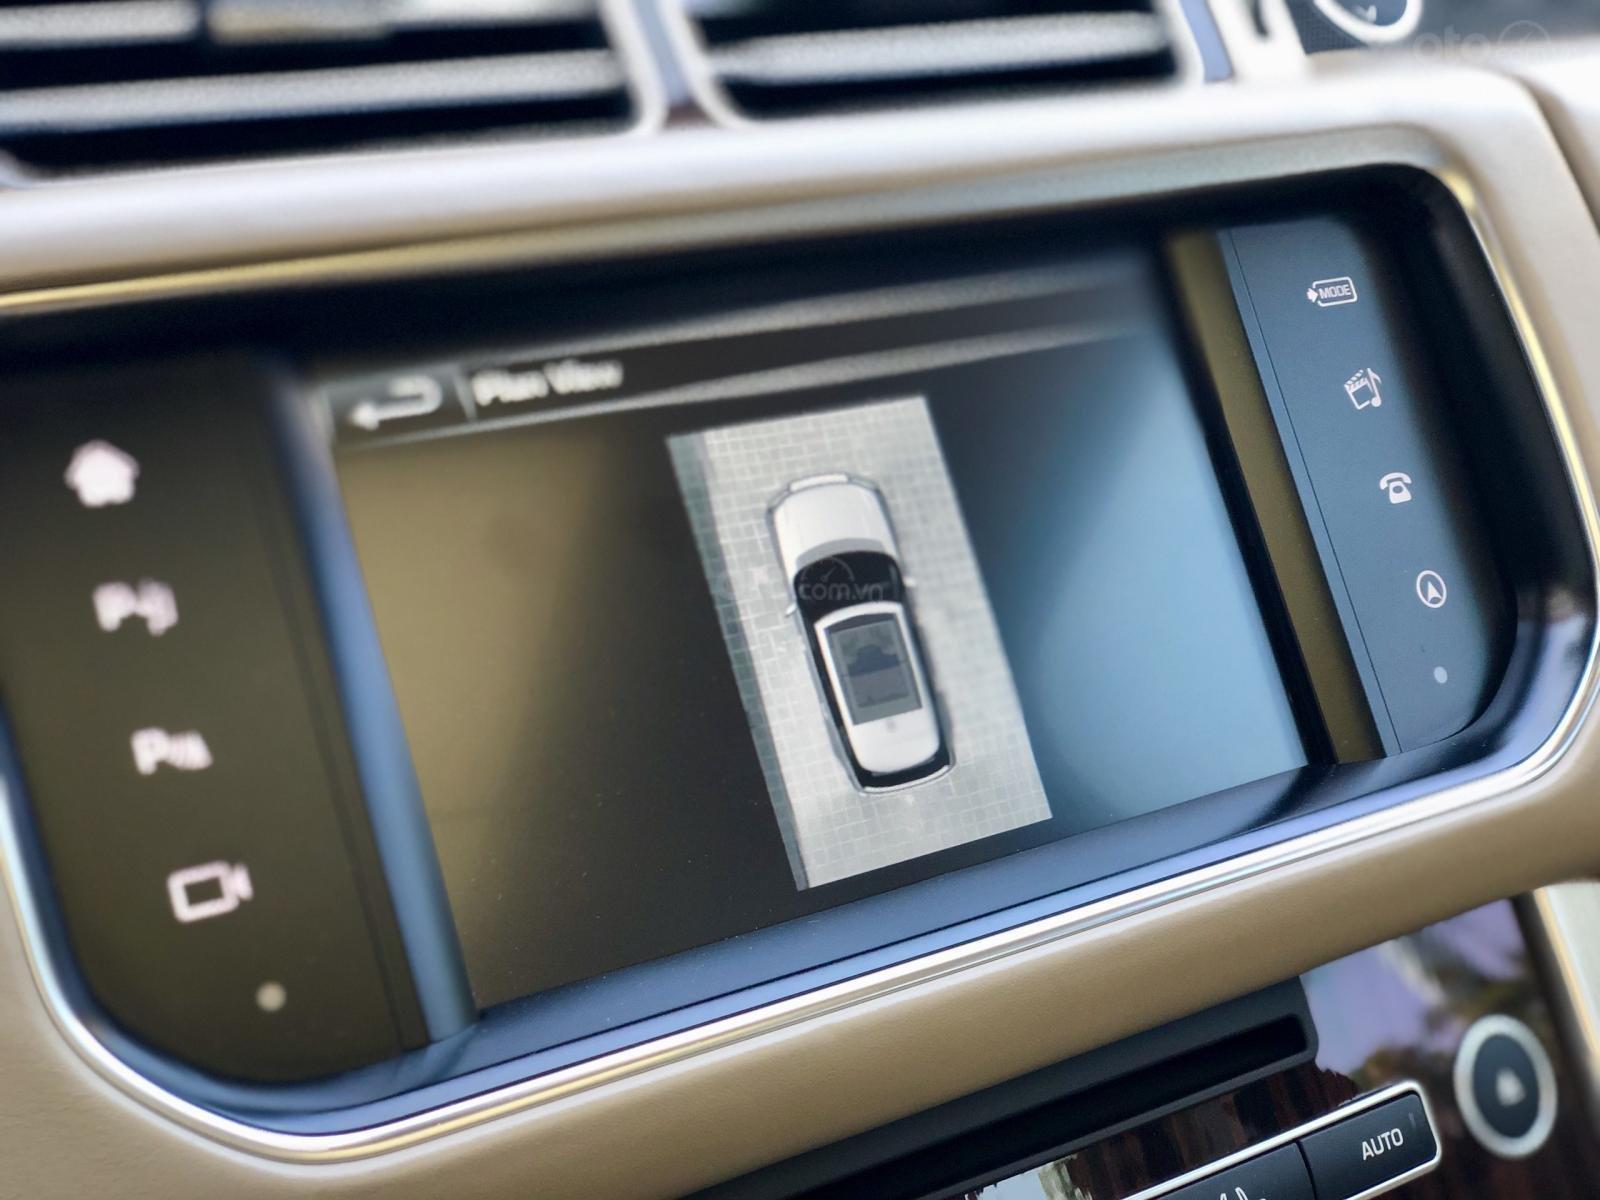 Bán Range Rover HSE 3.0 SX 2016 - Hotline 0945.39.2468 Ms Hương (9)